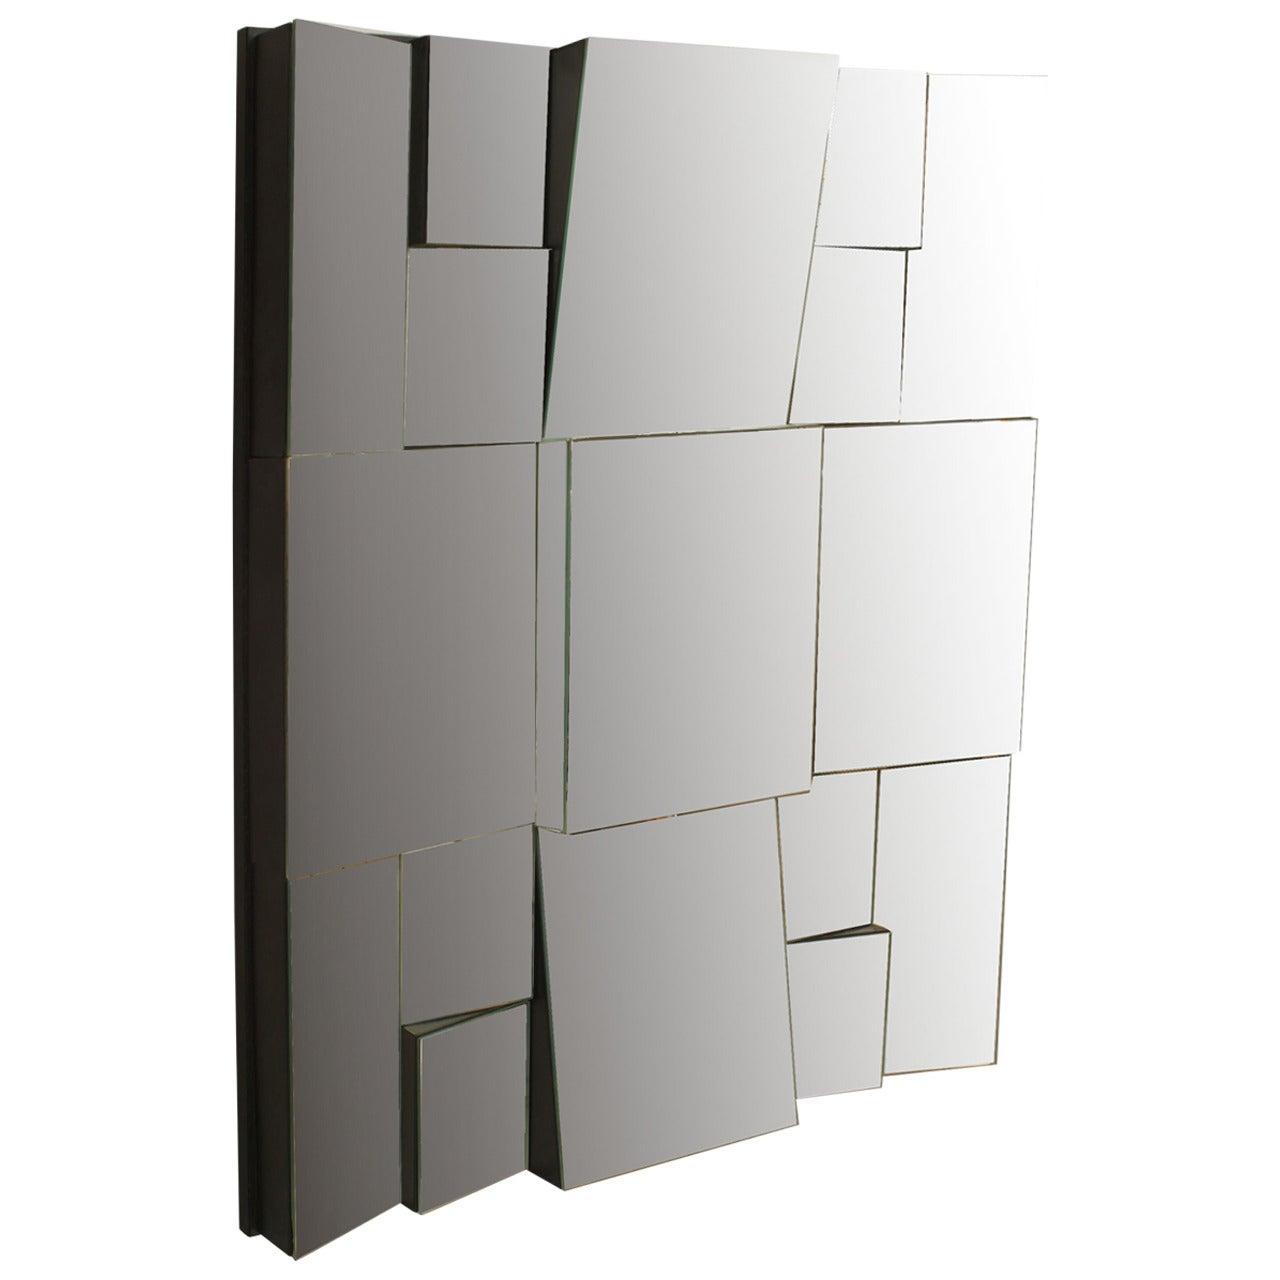 Neal Small Modern Cubist Design Multi-Faced Wall Mirror